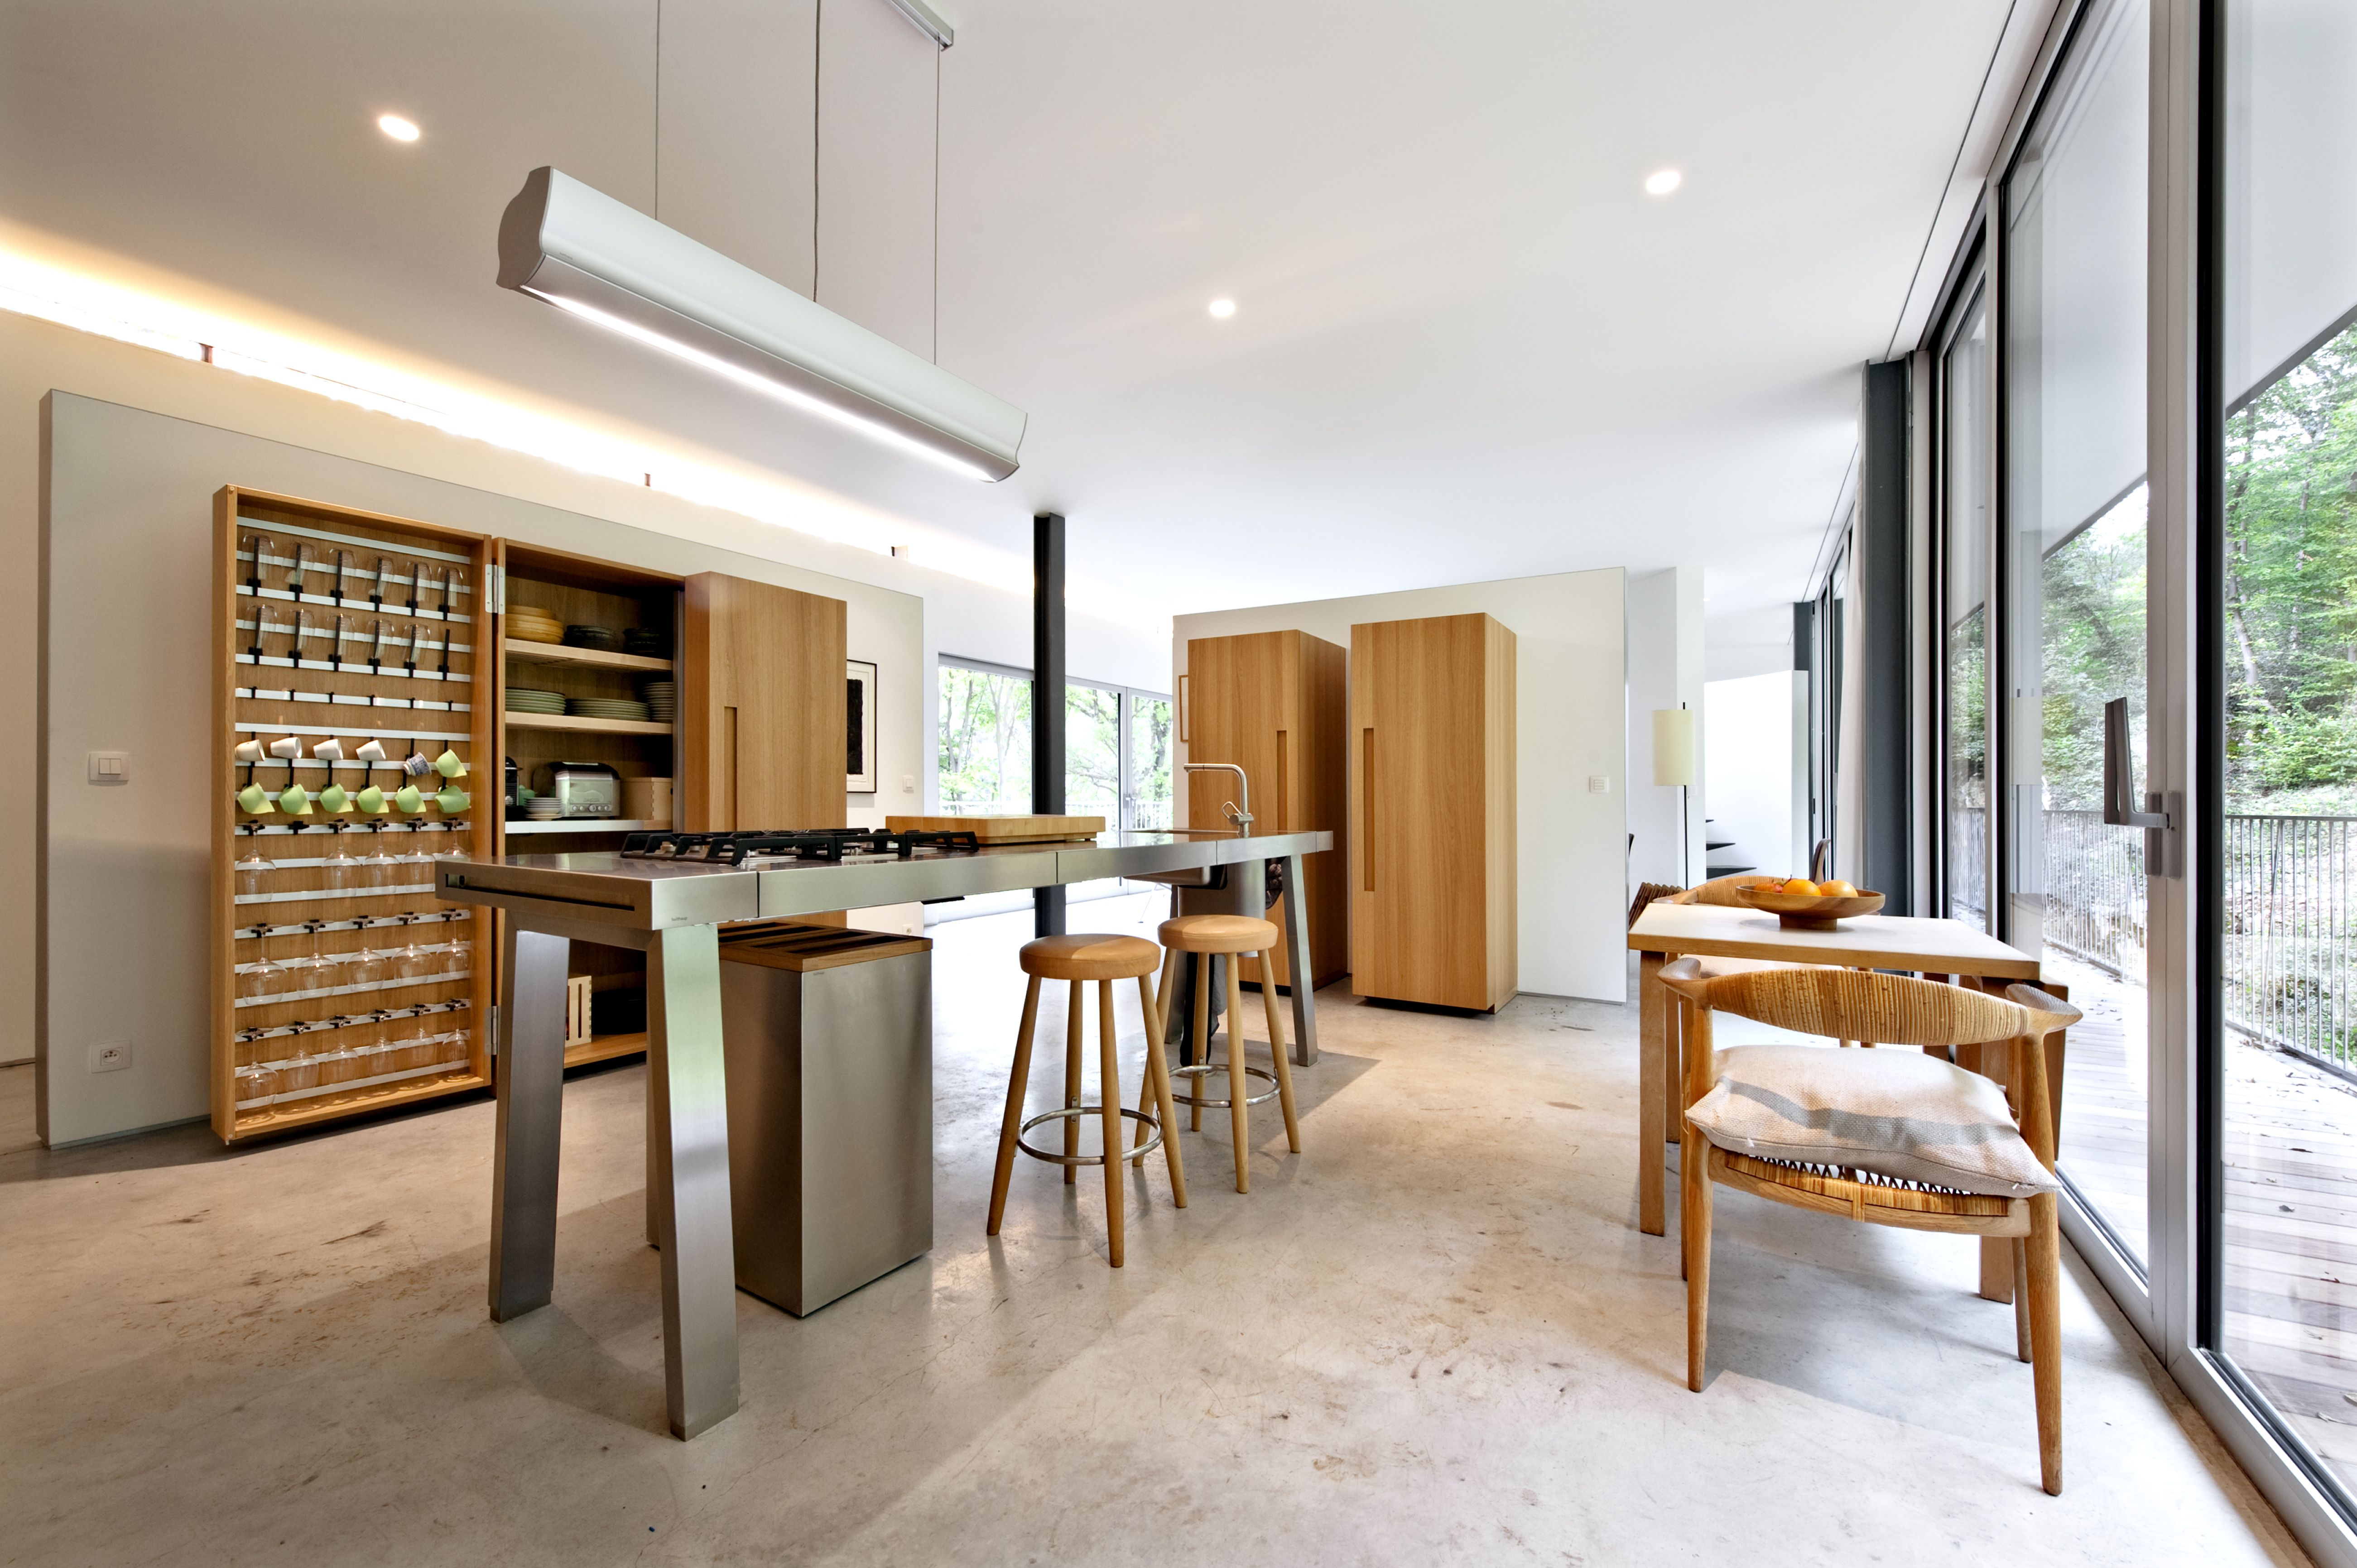 bulthaup cuisine b2 r alisation par the kitchen. Black Bedroom Furniture Sets. Home Design Ideas